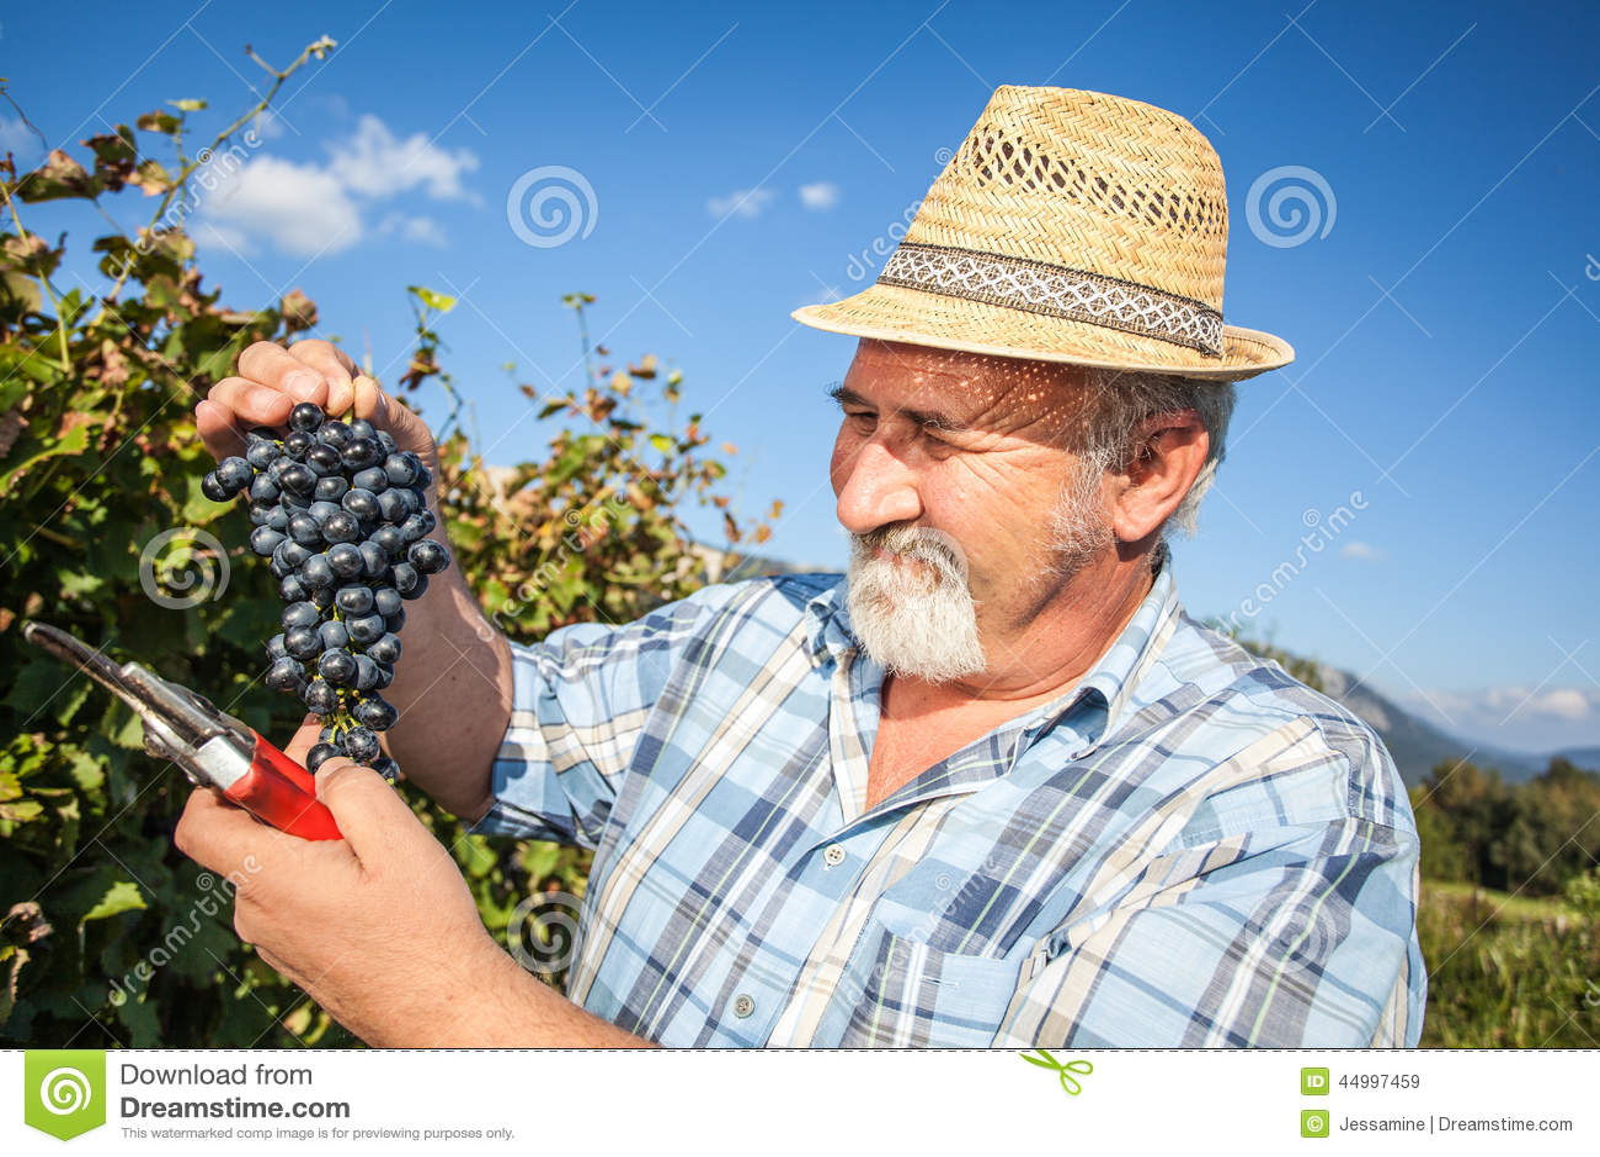 Viticulteur mûr moissonnant les raisins noirs